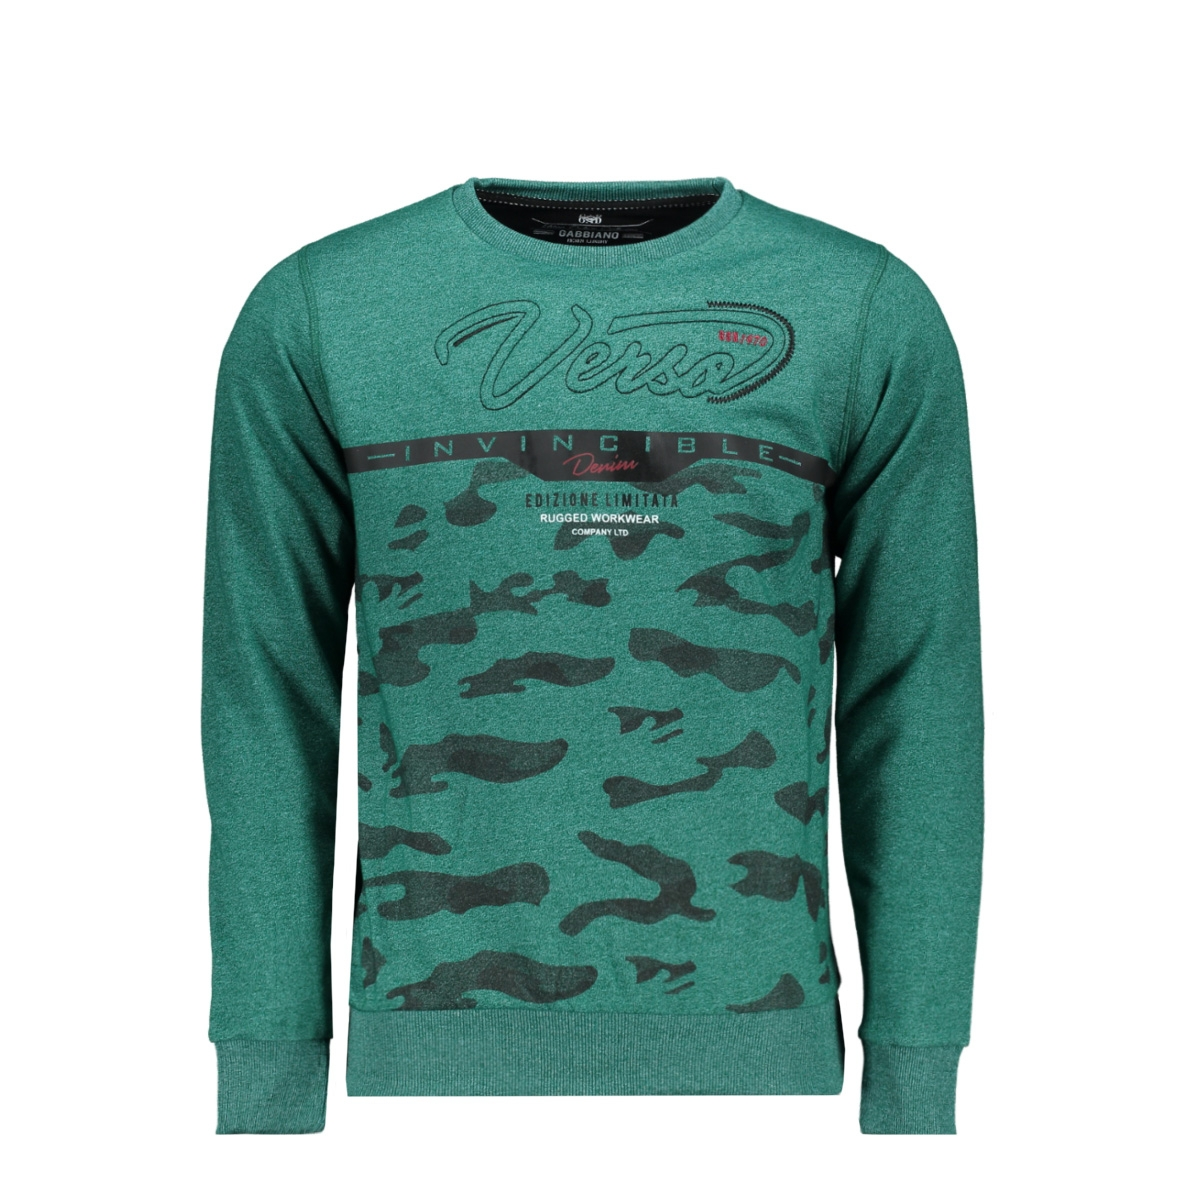 76134 gabbiano sweater green